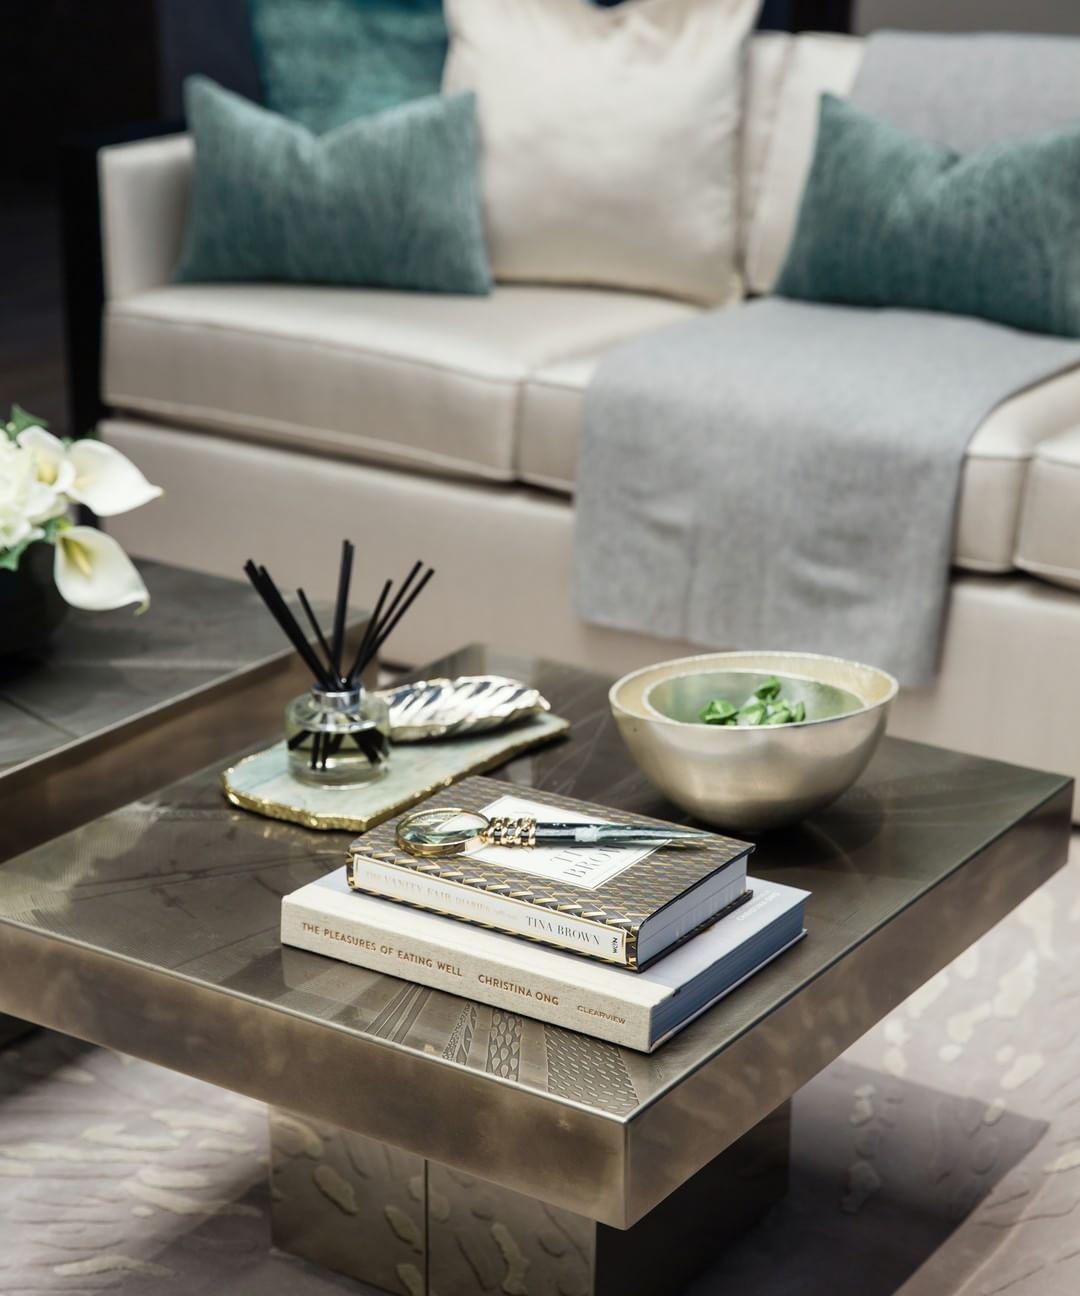 We Love The Calm Relaxed Palette In Our Recent Dubai Project Dubai Uae Dubaiinteriordesig Coffee Table Accessories Coffee Table Table Accessories [ 1296 x 1080 Pixel ]